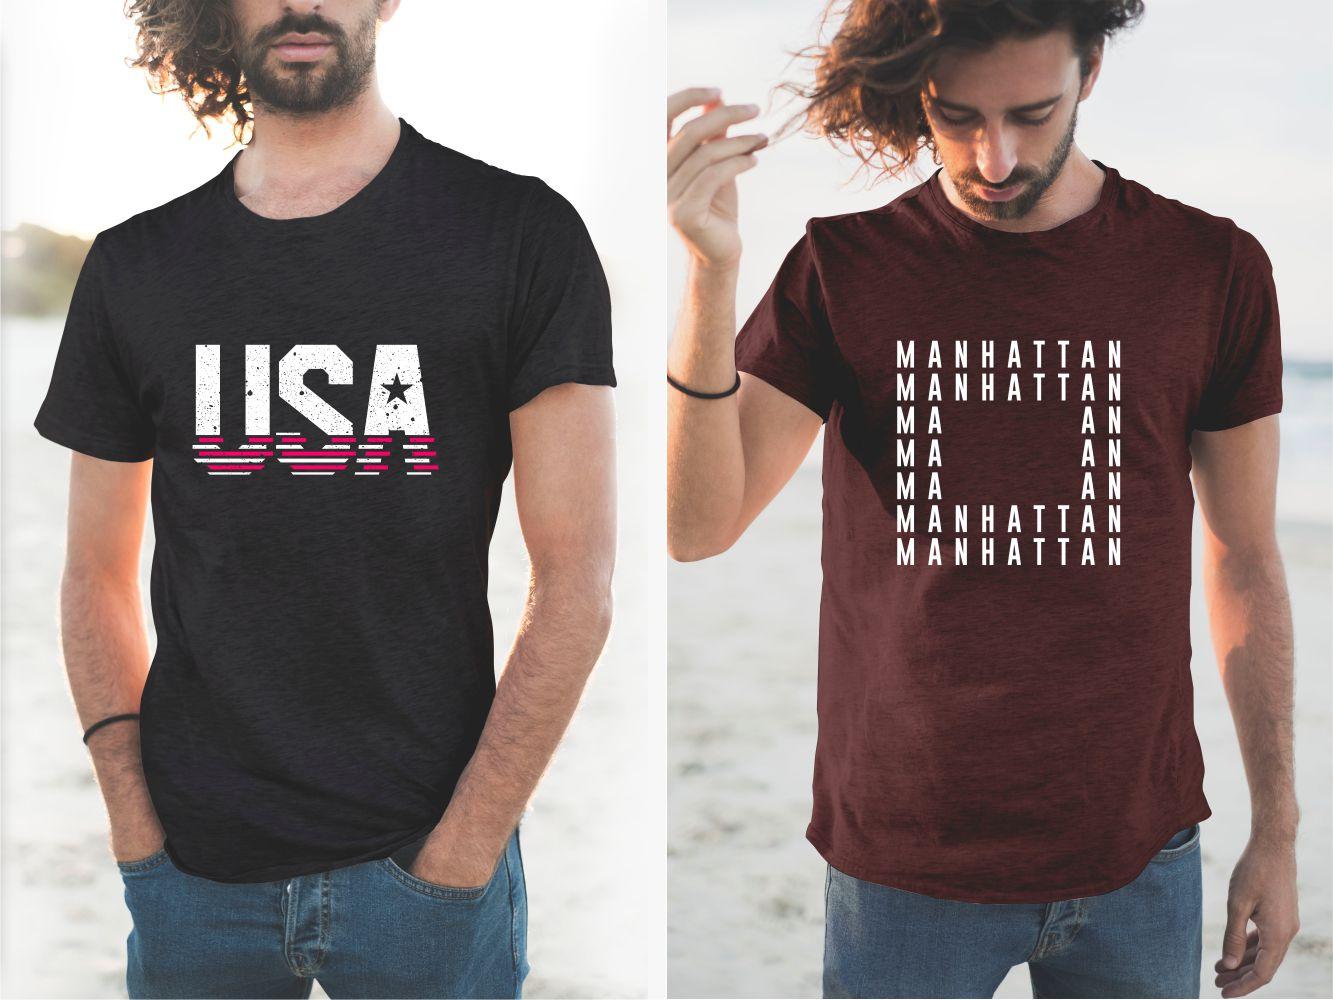 106 Urban T-shirt Designs Collection - 9 7